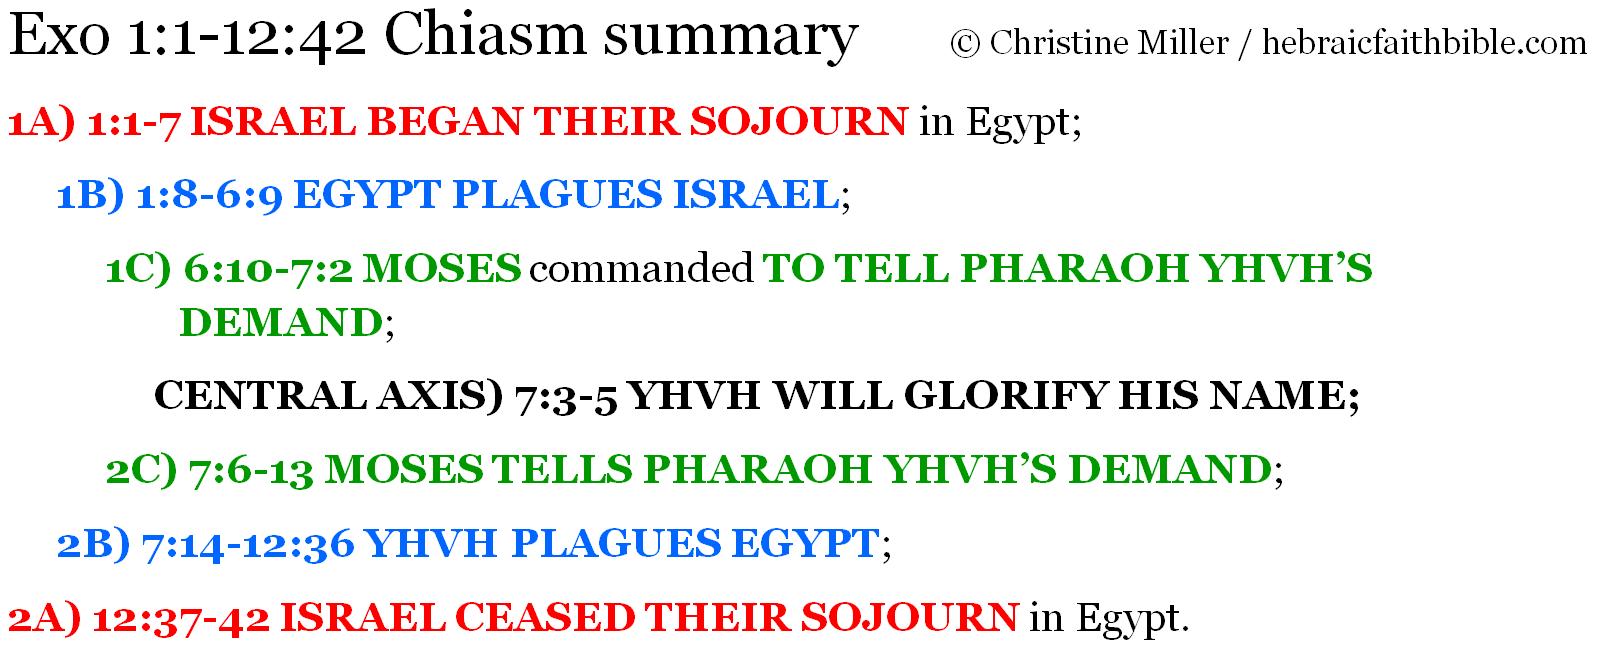 Exo 1:1-12:42 Chiasm summary | hebraicfaithbible.com